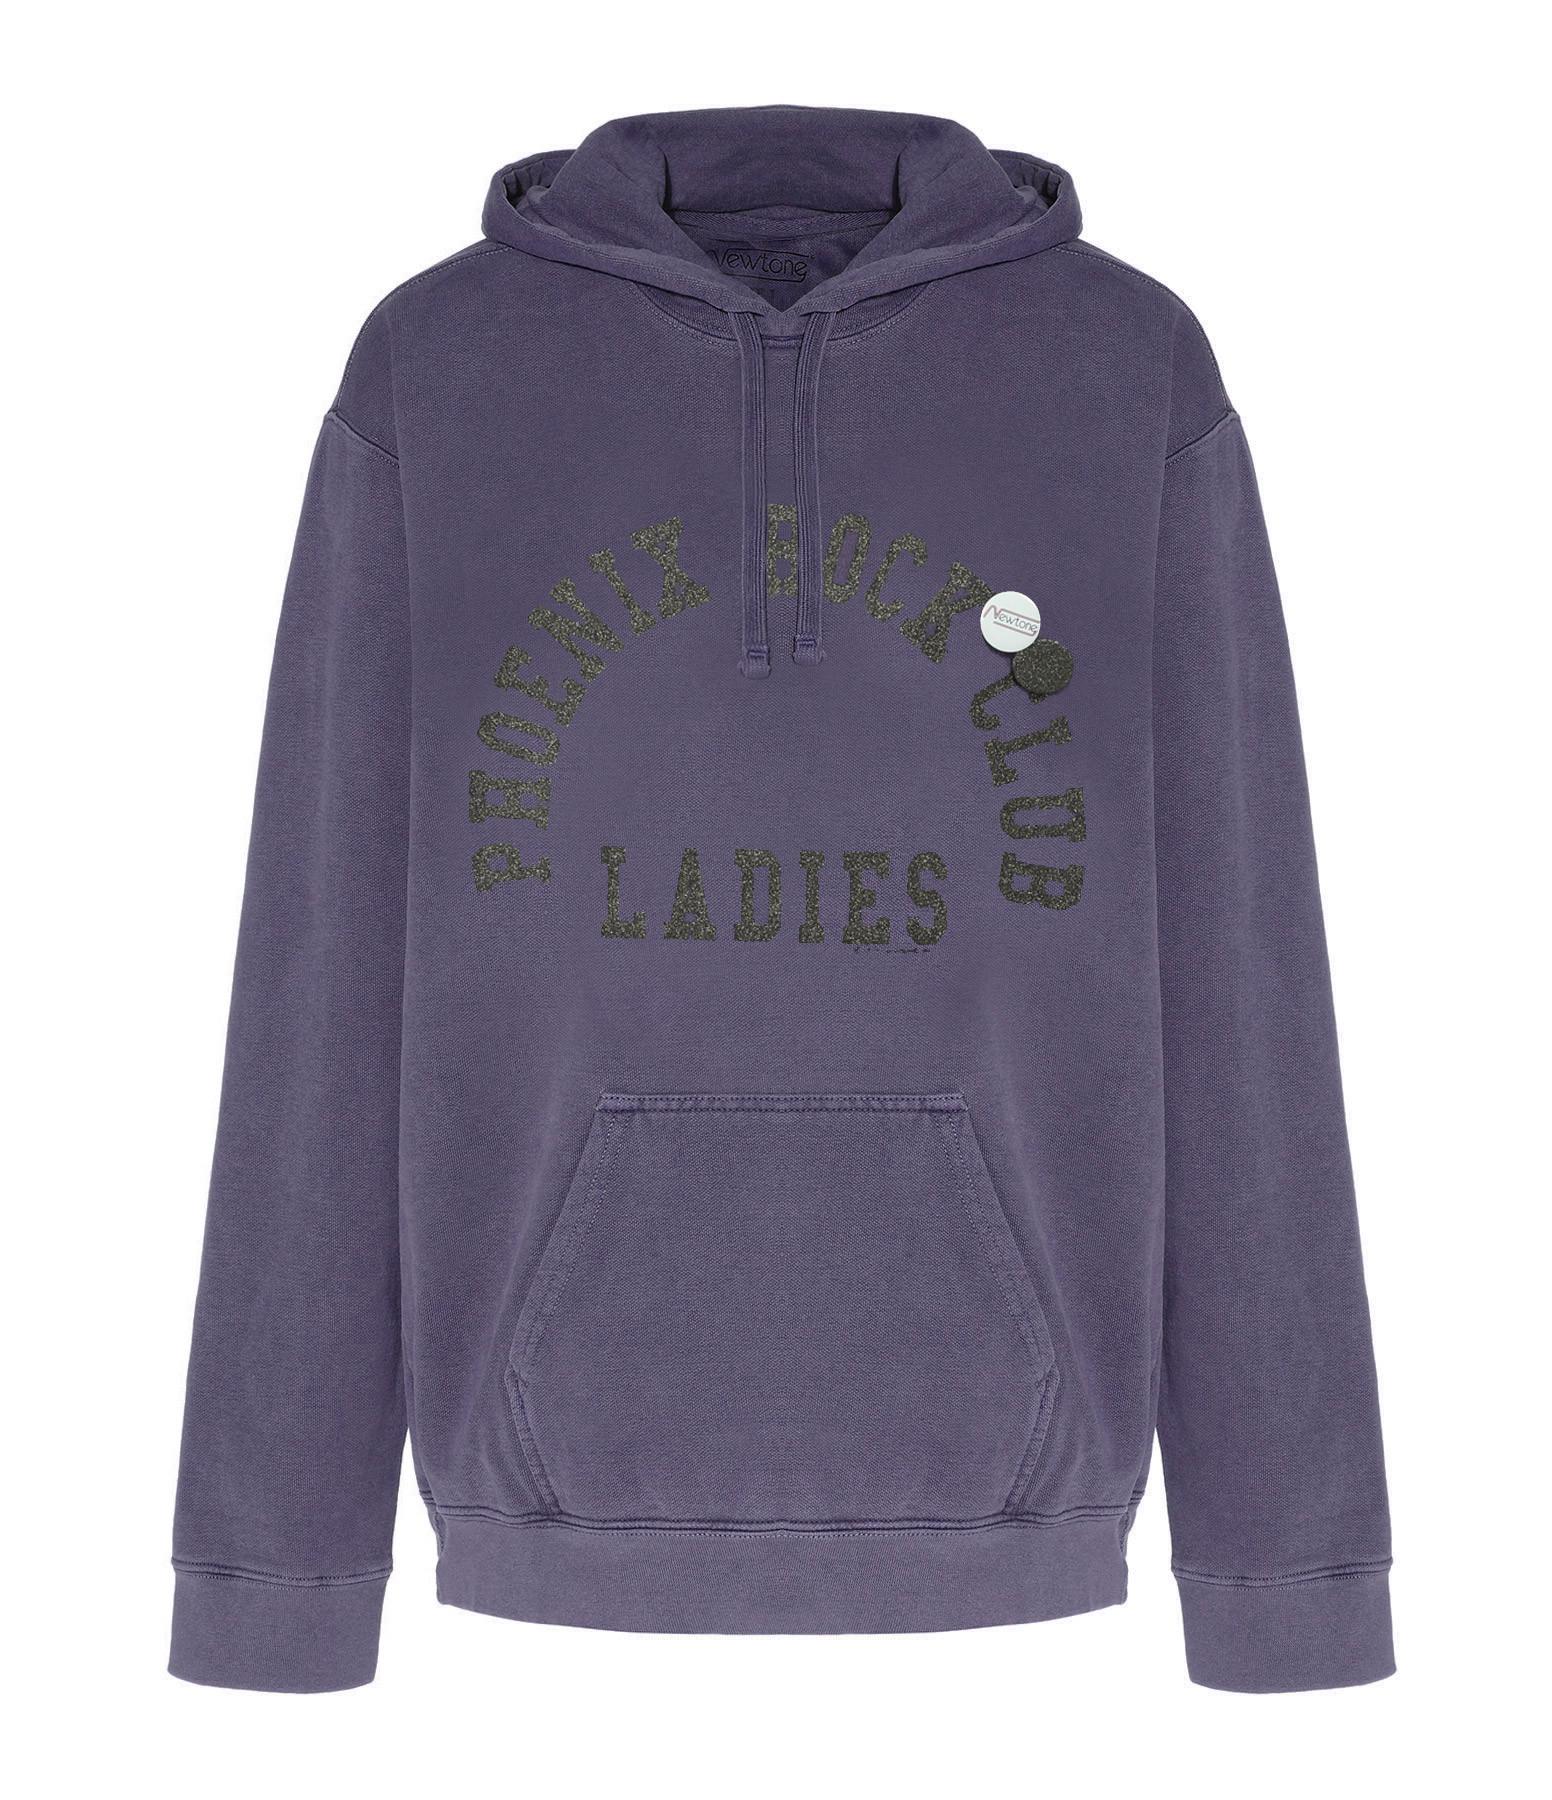 NEWTONE - Sweatshirt Hoody Phoenix Coton Violet Grappe